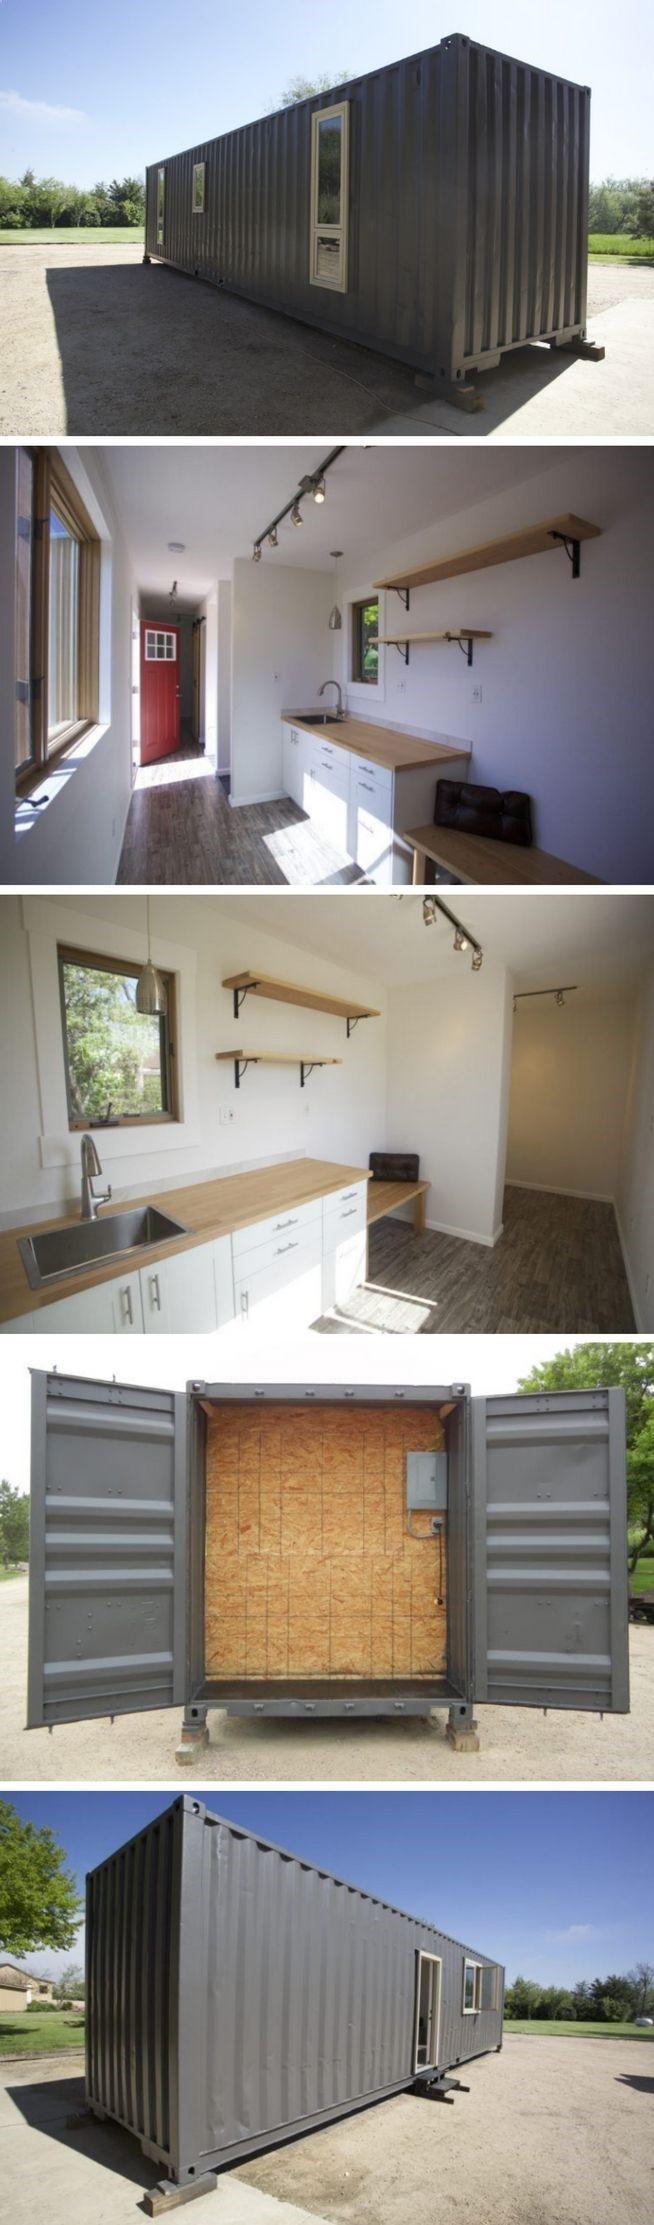 25 Best Back Yard Joy Images On Pinterest Architecture Fa Ades  # Muebles New Style Villa Tesei